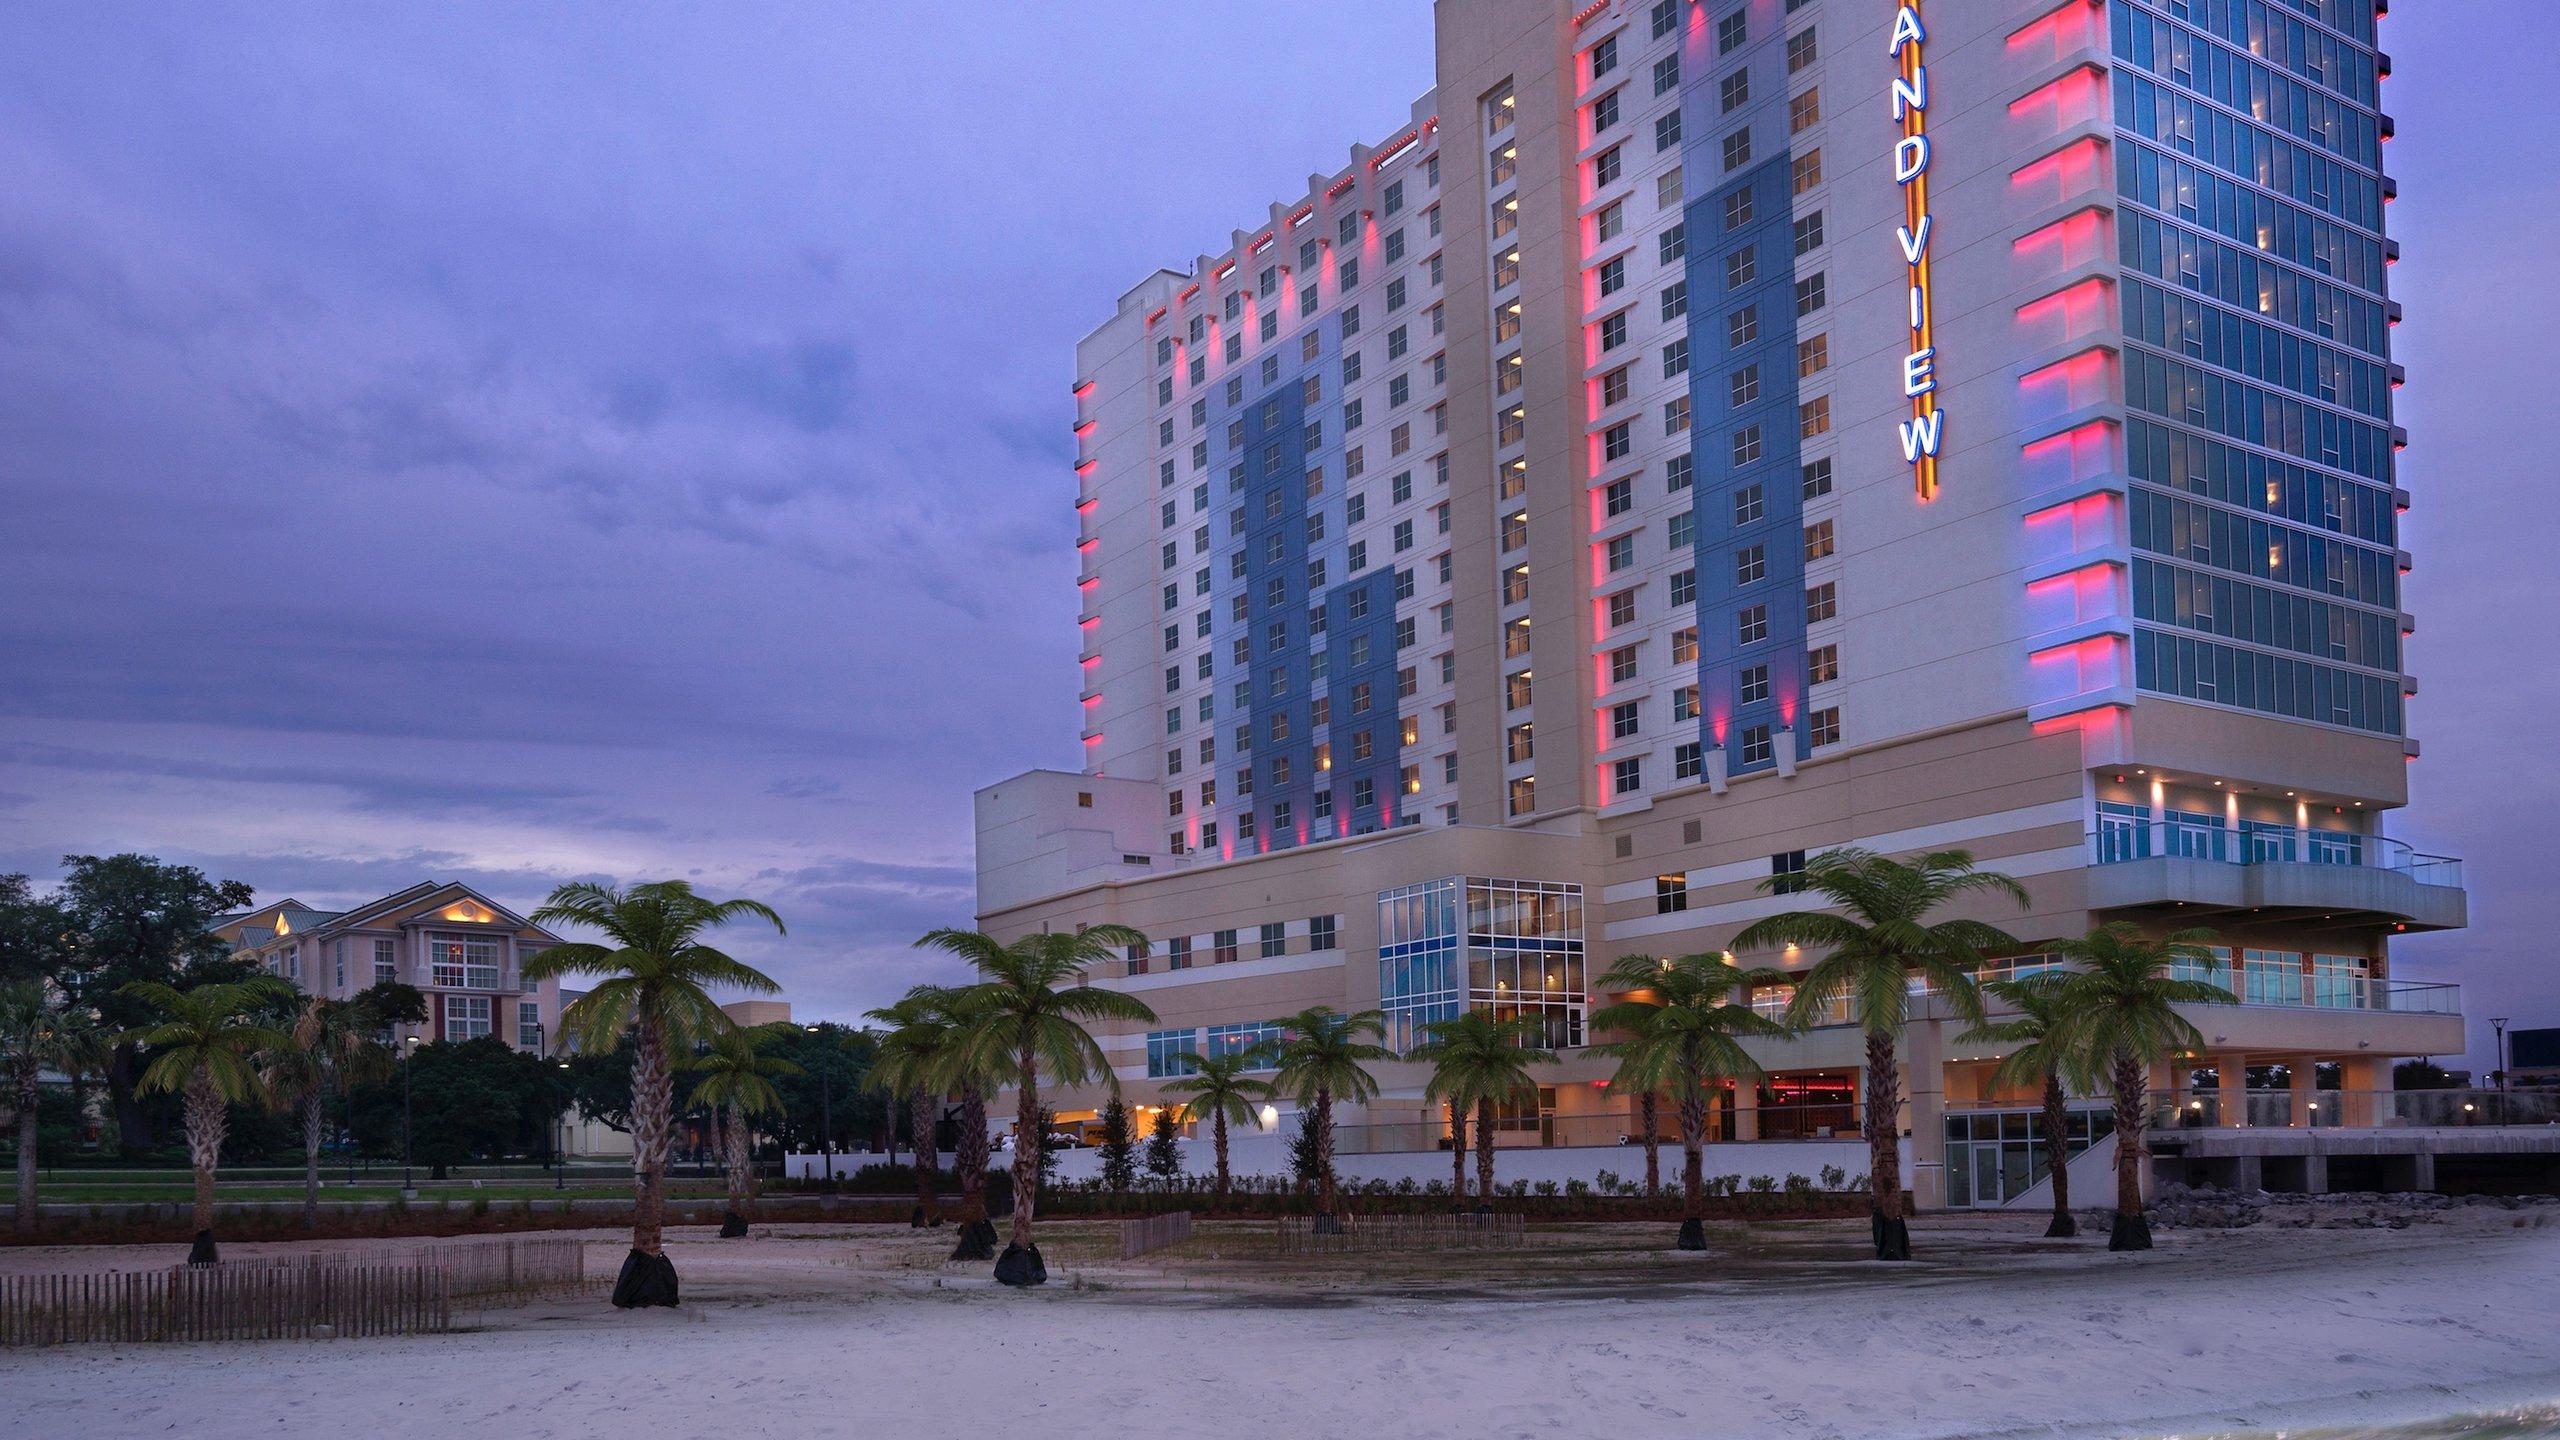 Biloxi Hotels From 50 Cheap Hotel Deals Travelocity